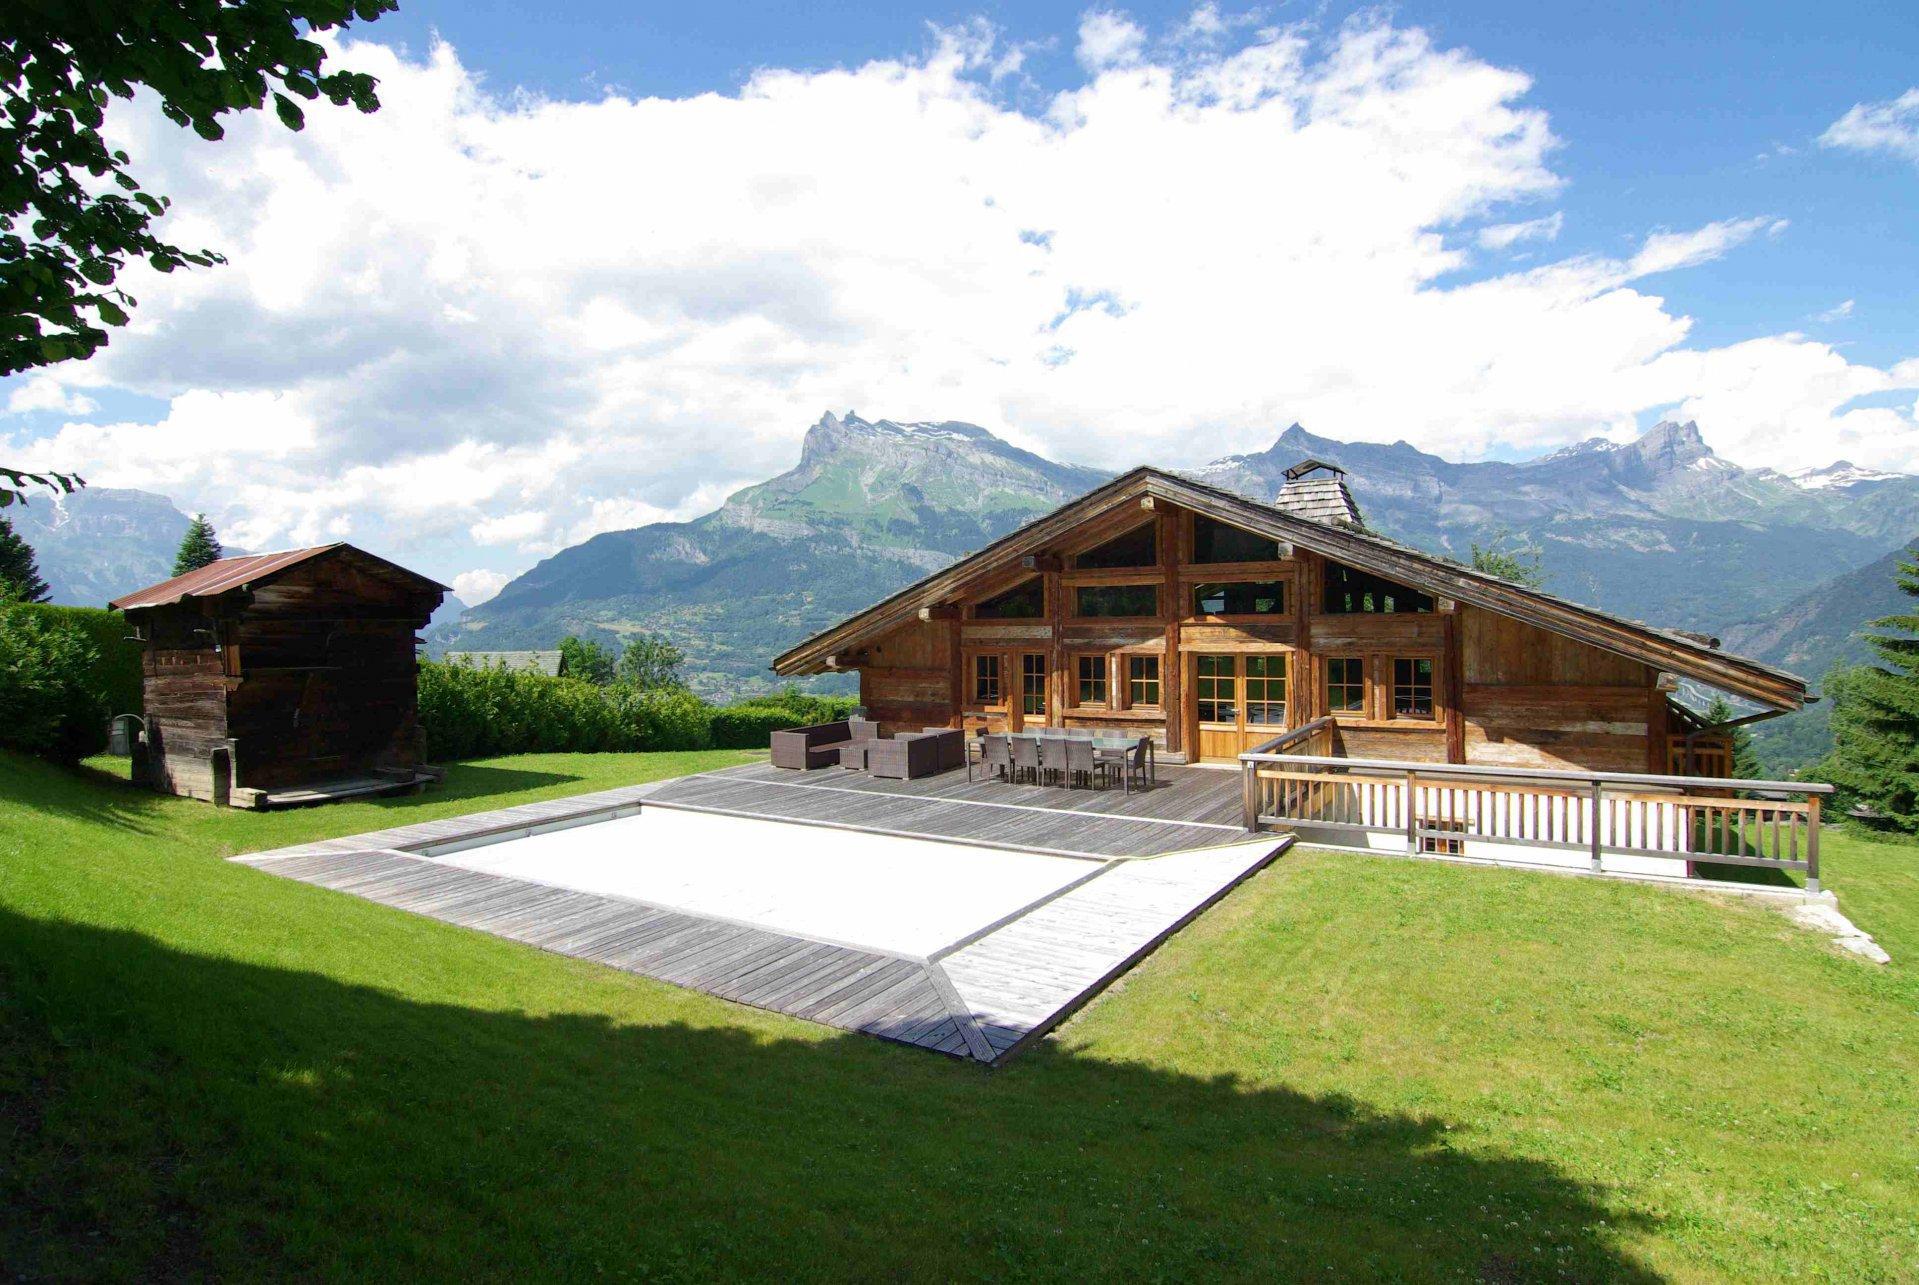 Casa tipica 8 camere con bagno privato, Saint-Gervais Mont-Blanc